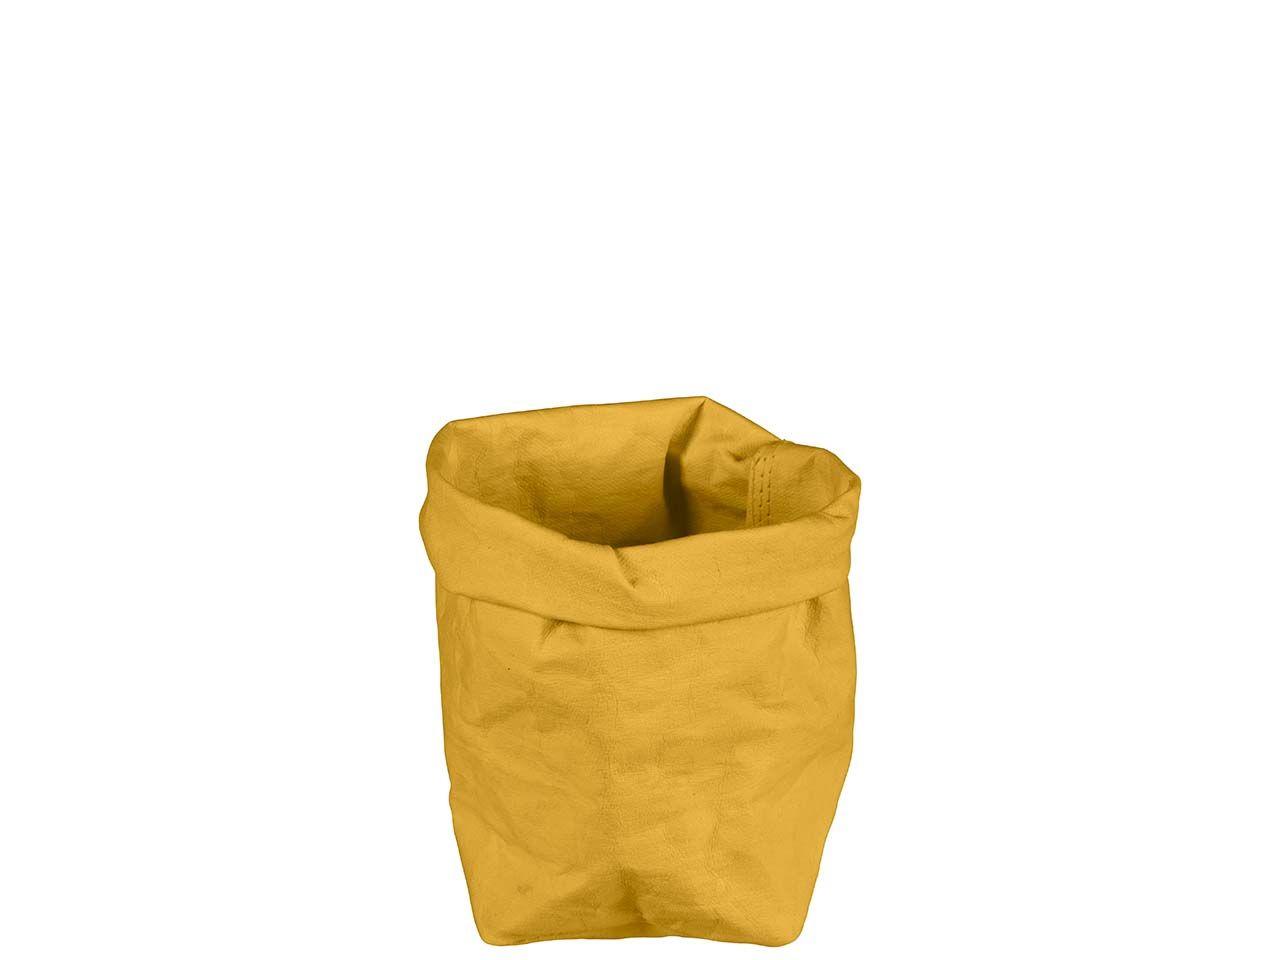 "Krempelbox ""STUFF"" aus Papyr, Gr. S, banana 11611 banana"